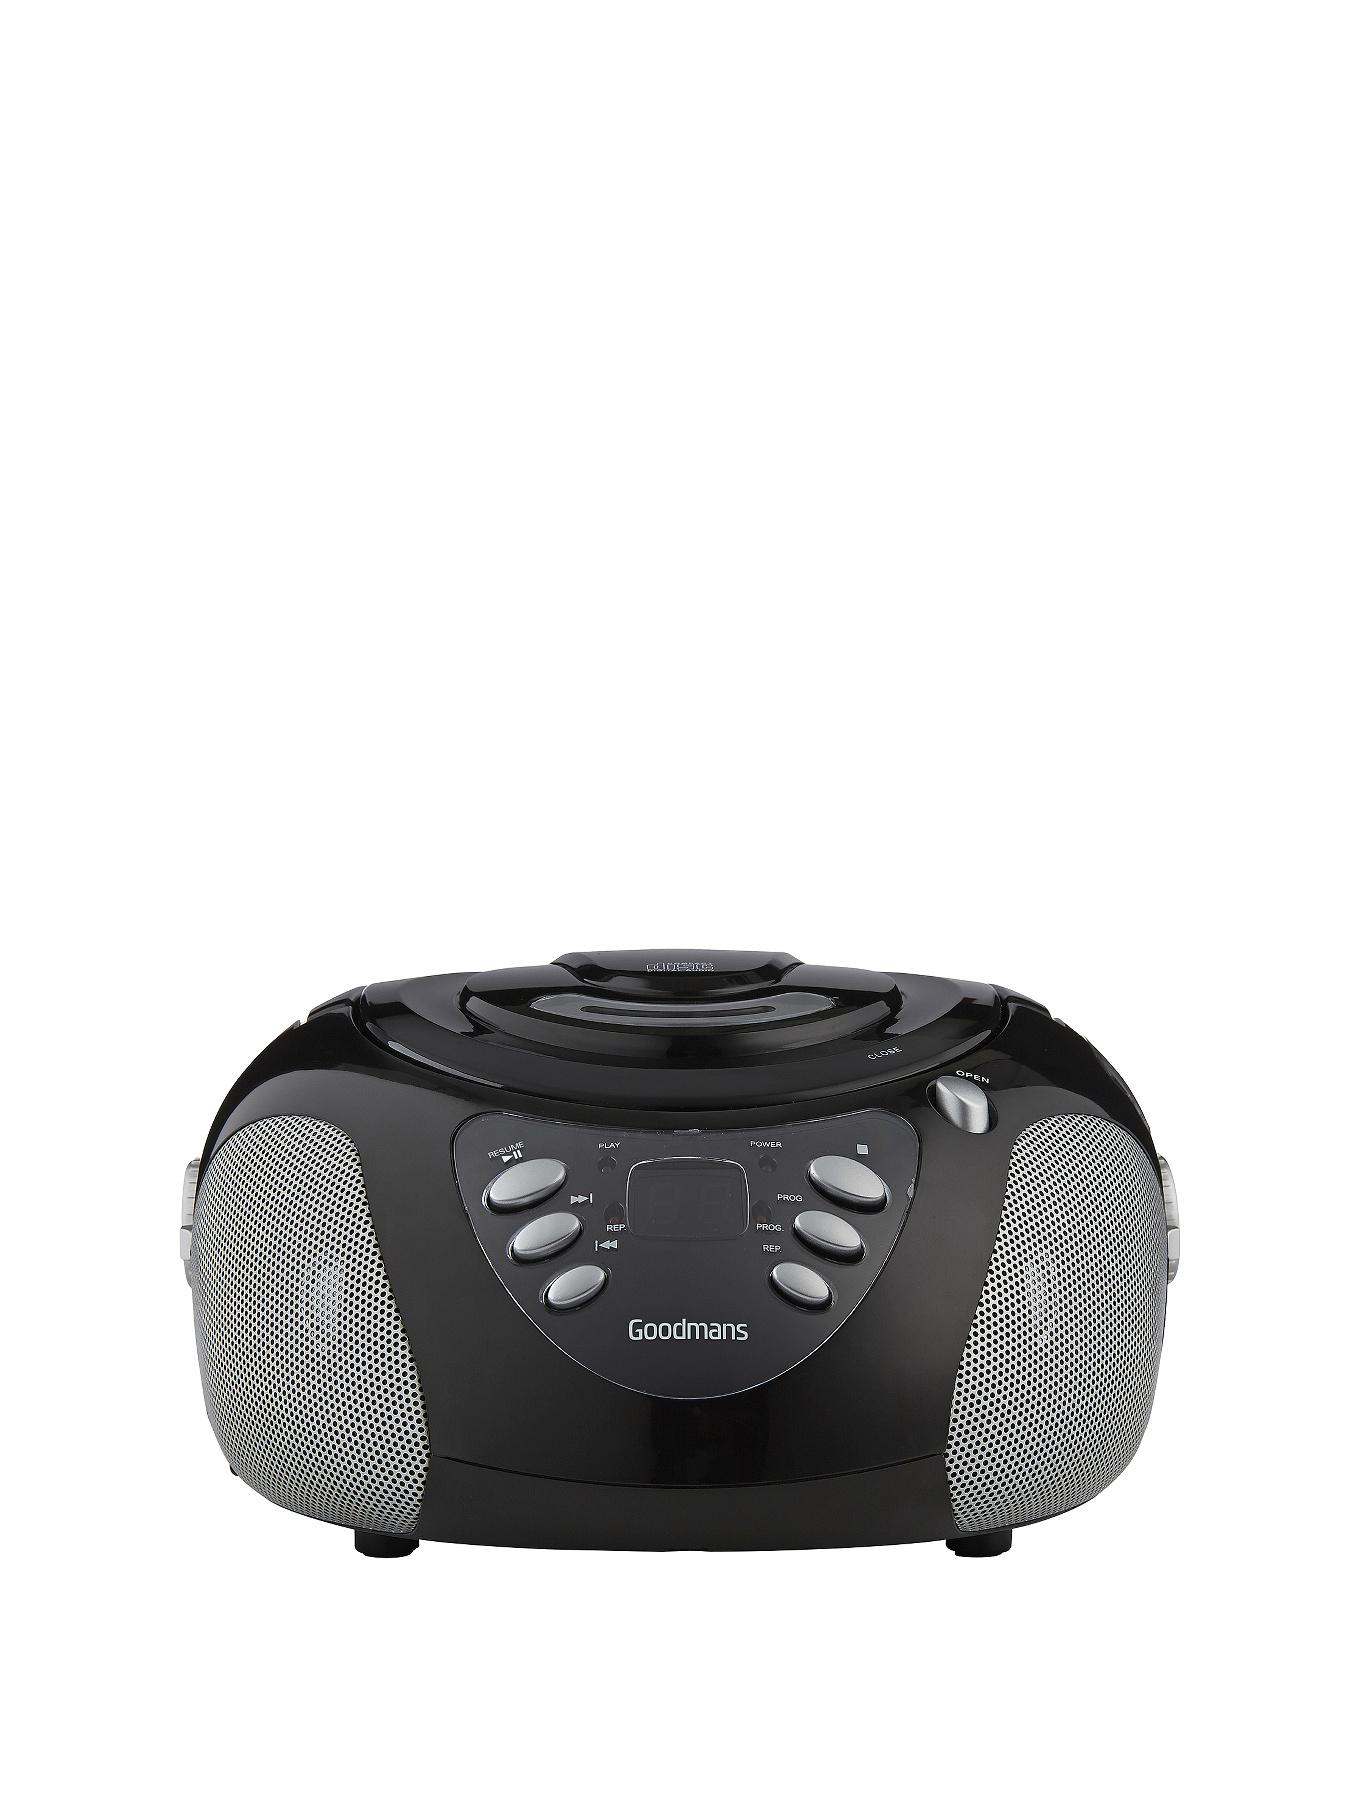 Goodmans GPS02 CD Boombox